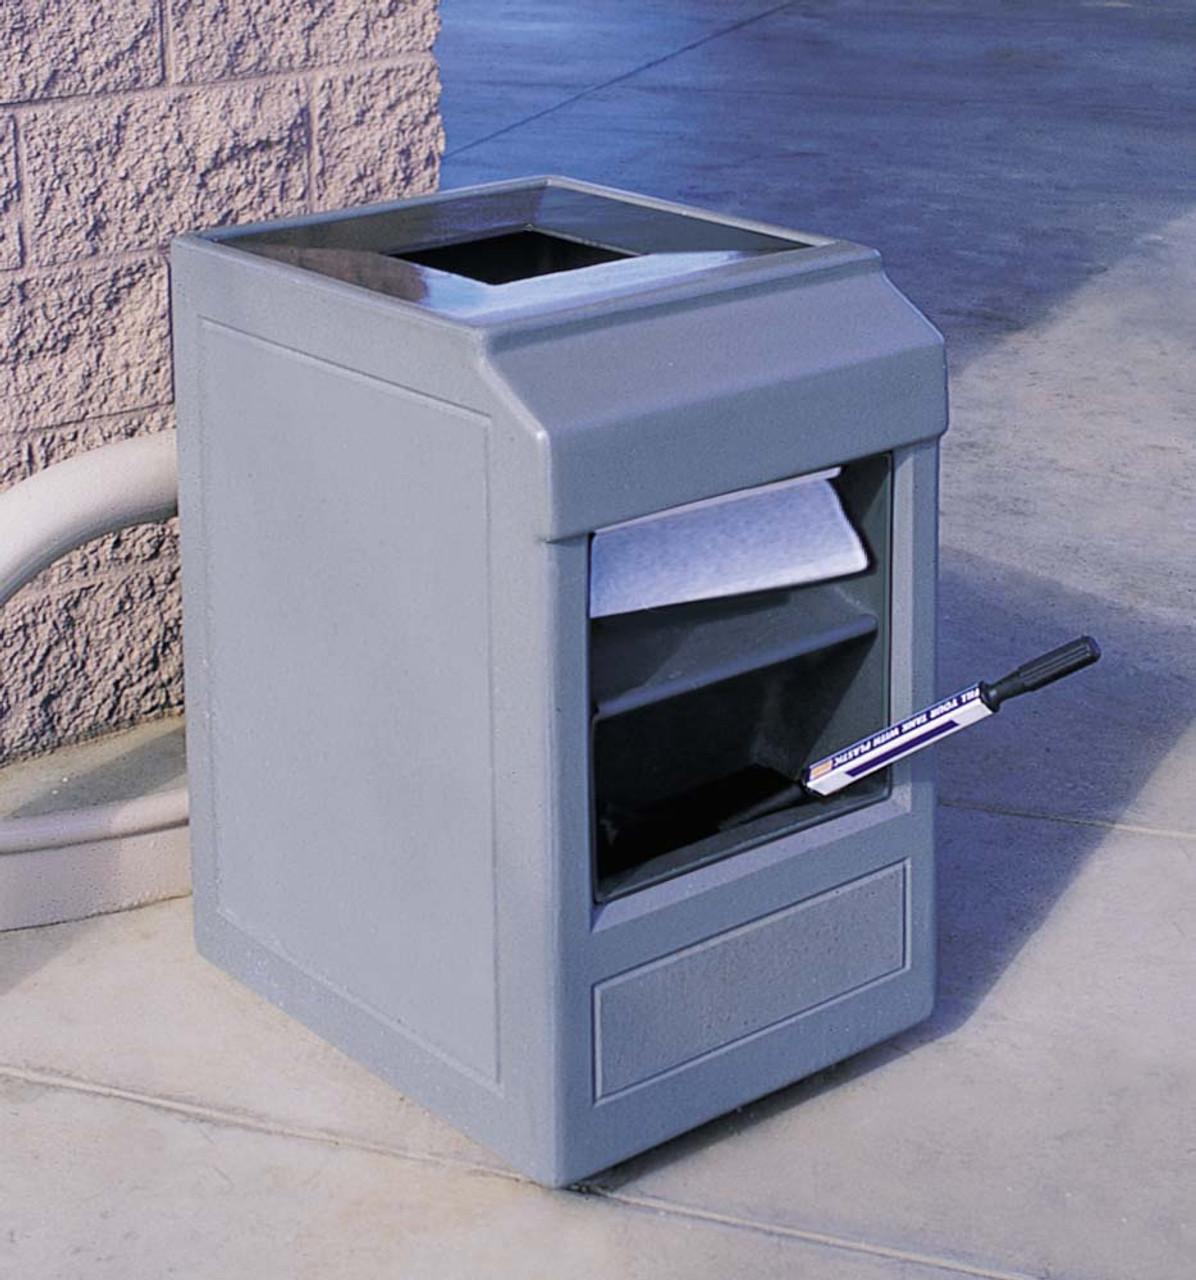 24 Gallon Concrete Auto Attendant Outdoor Waste Container TF1241 Weatherstone Gray